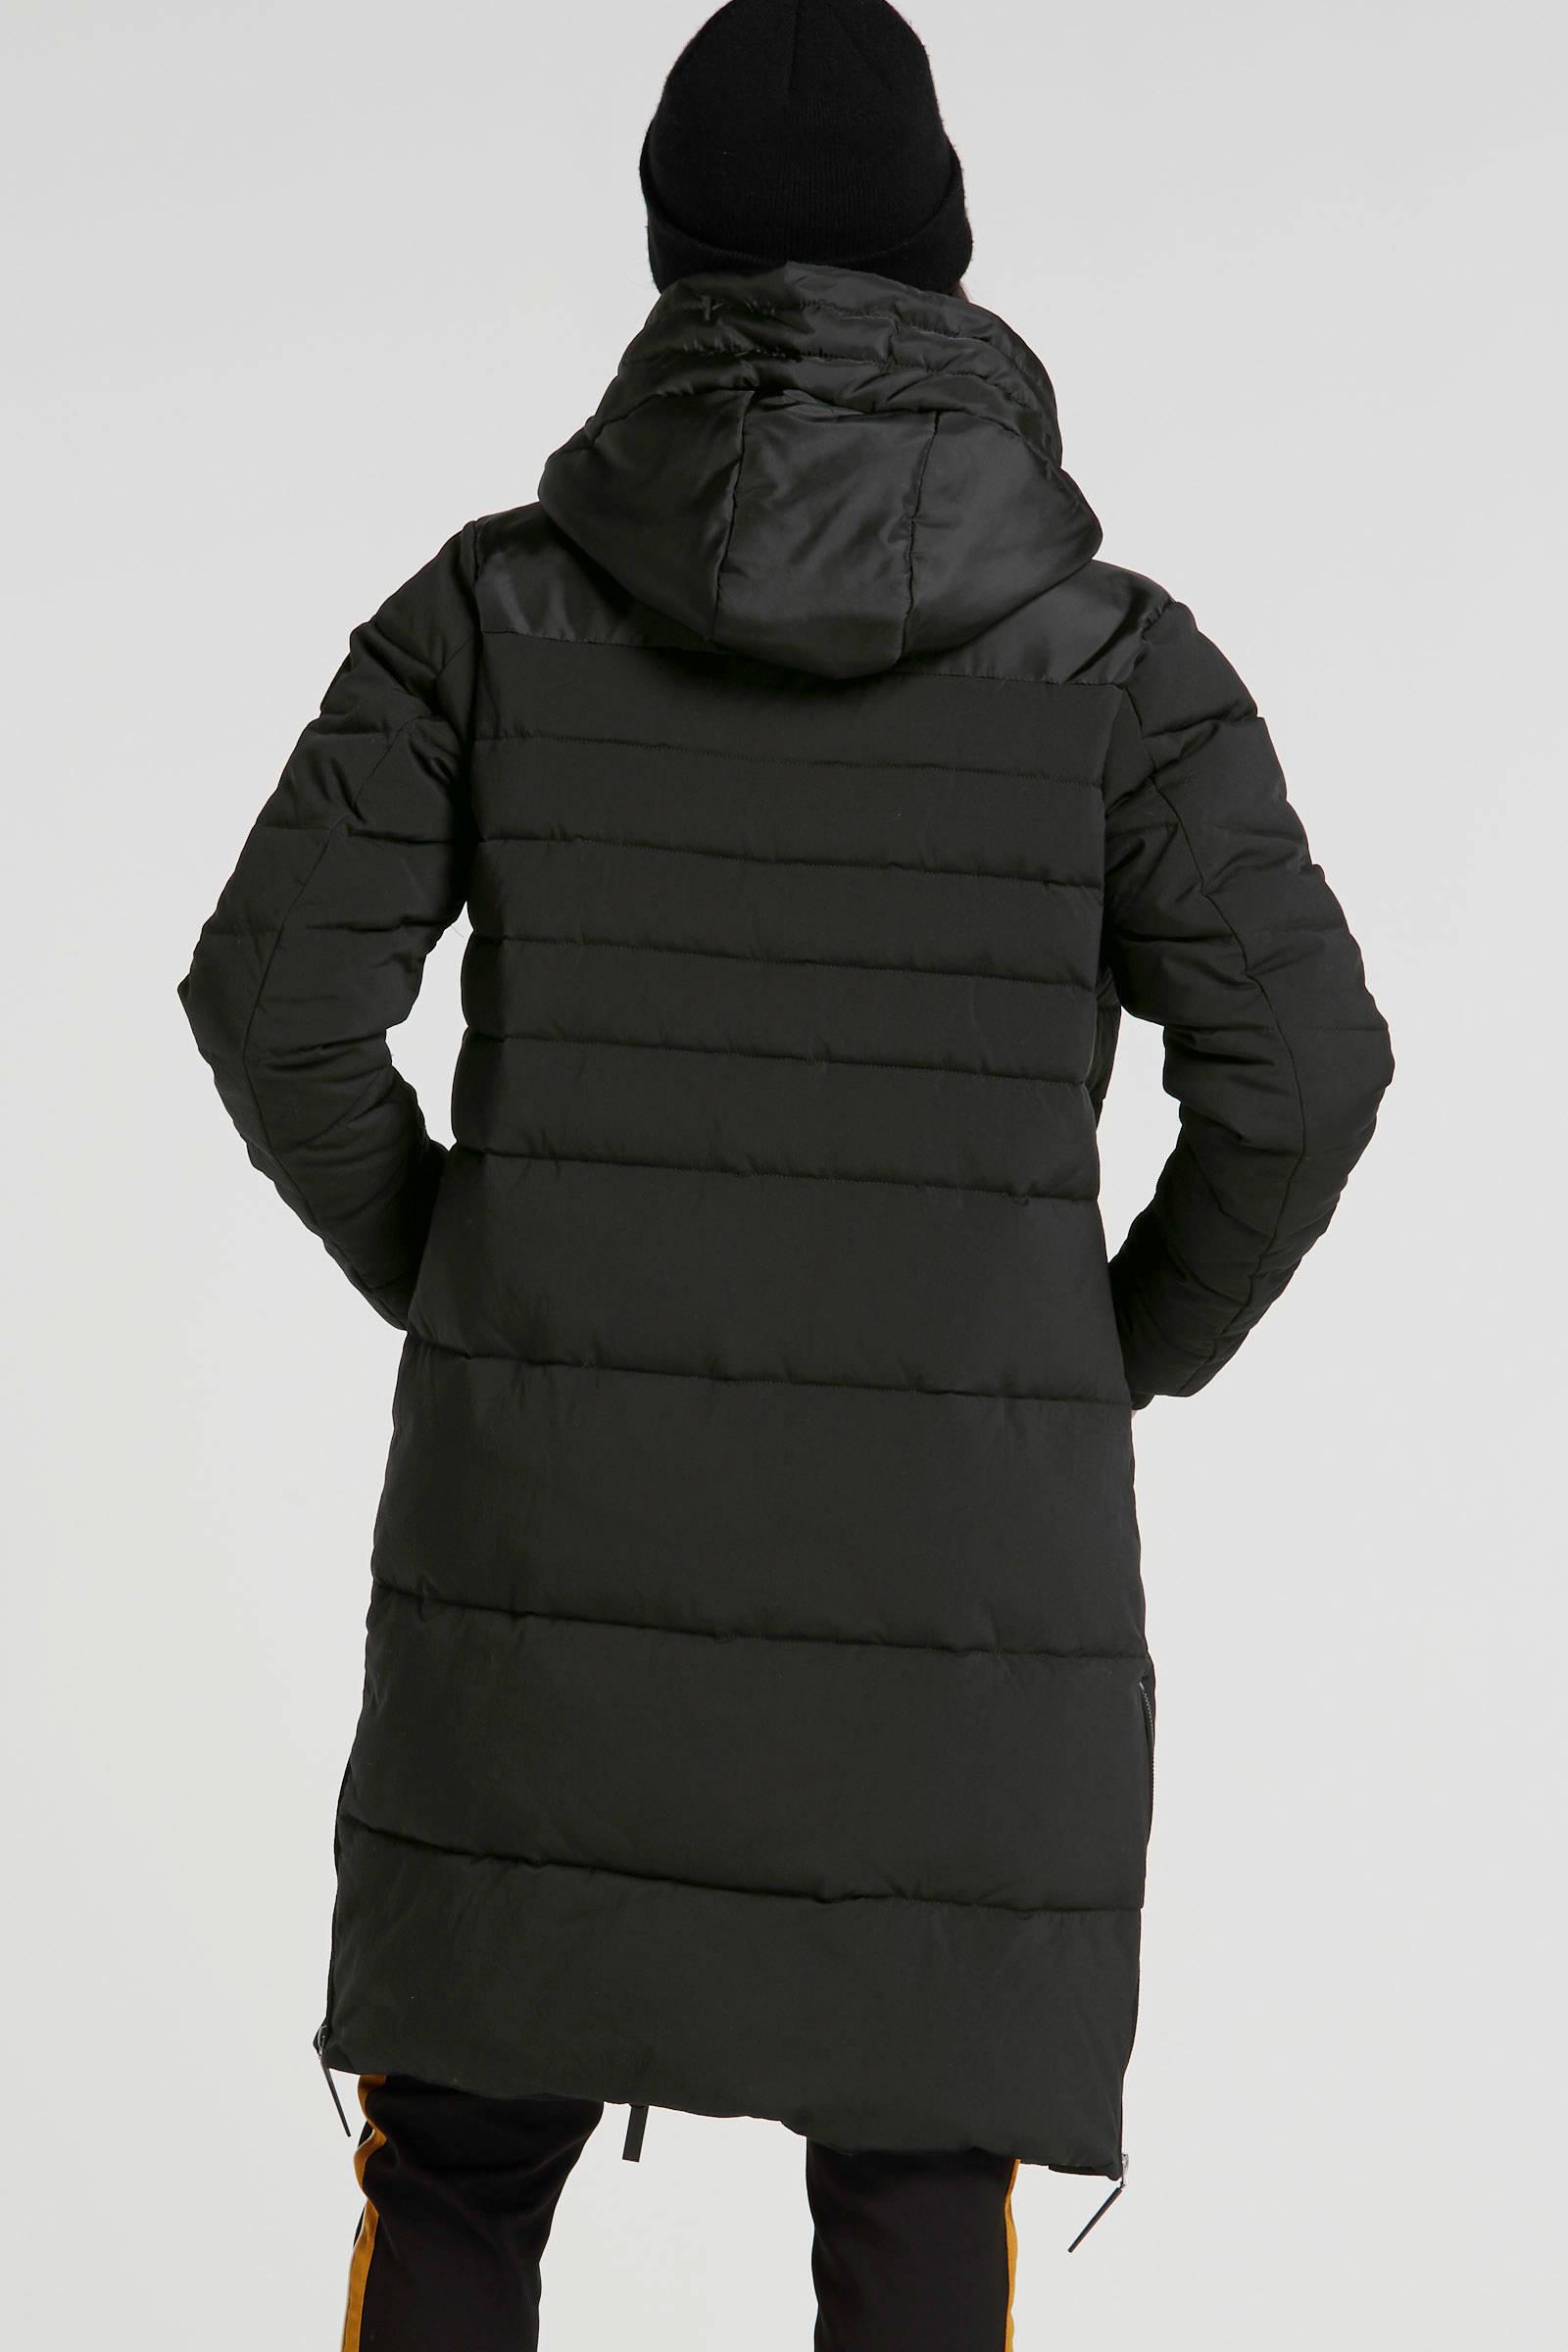 Giacomo gewatteerde winterjas zwart | wehkamp